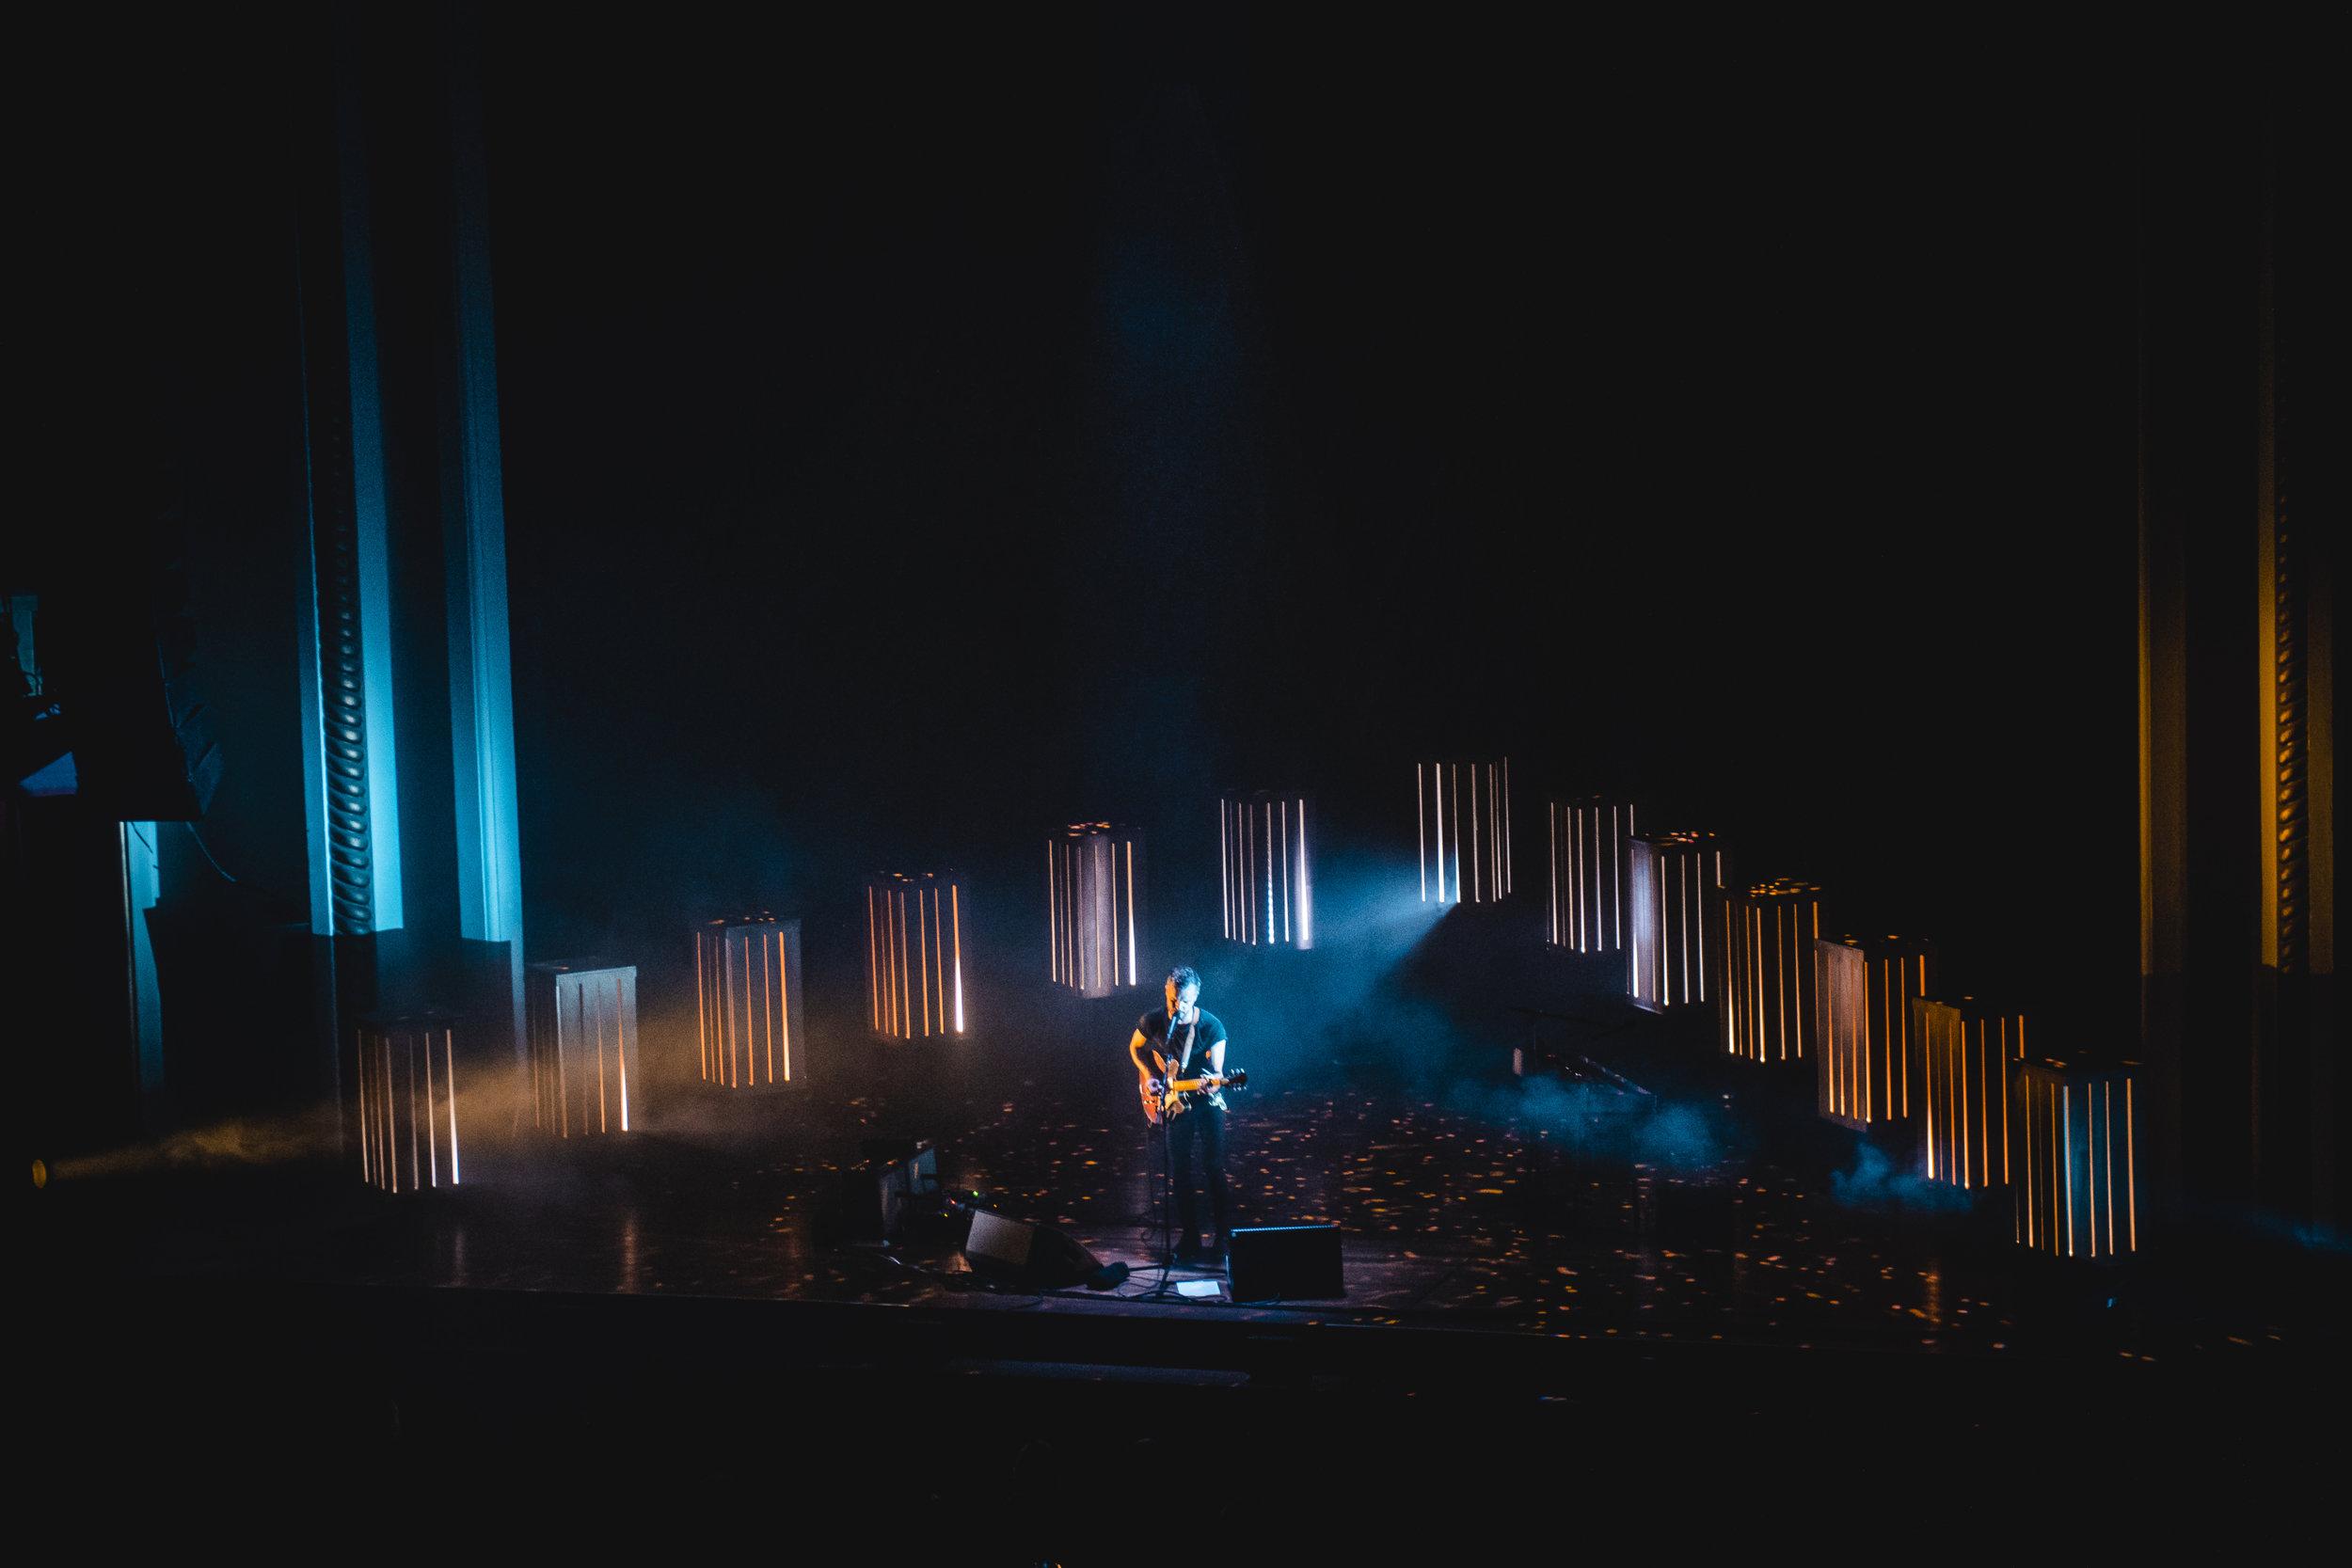 2018-09-27 - De Roma - The Tallest Man on Earth - 02 concert - 017.jpg